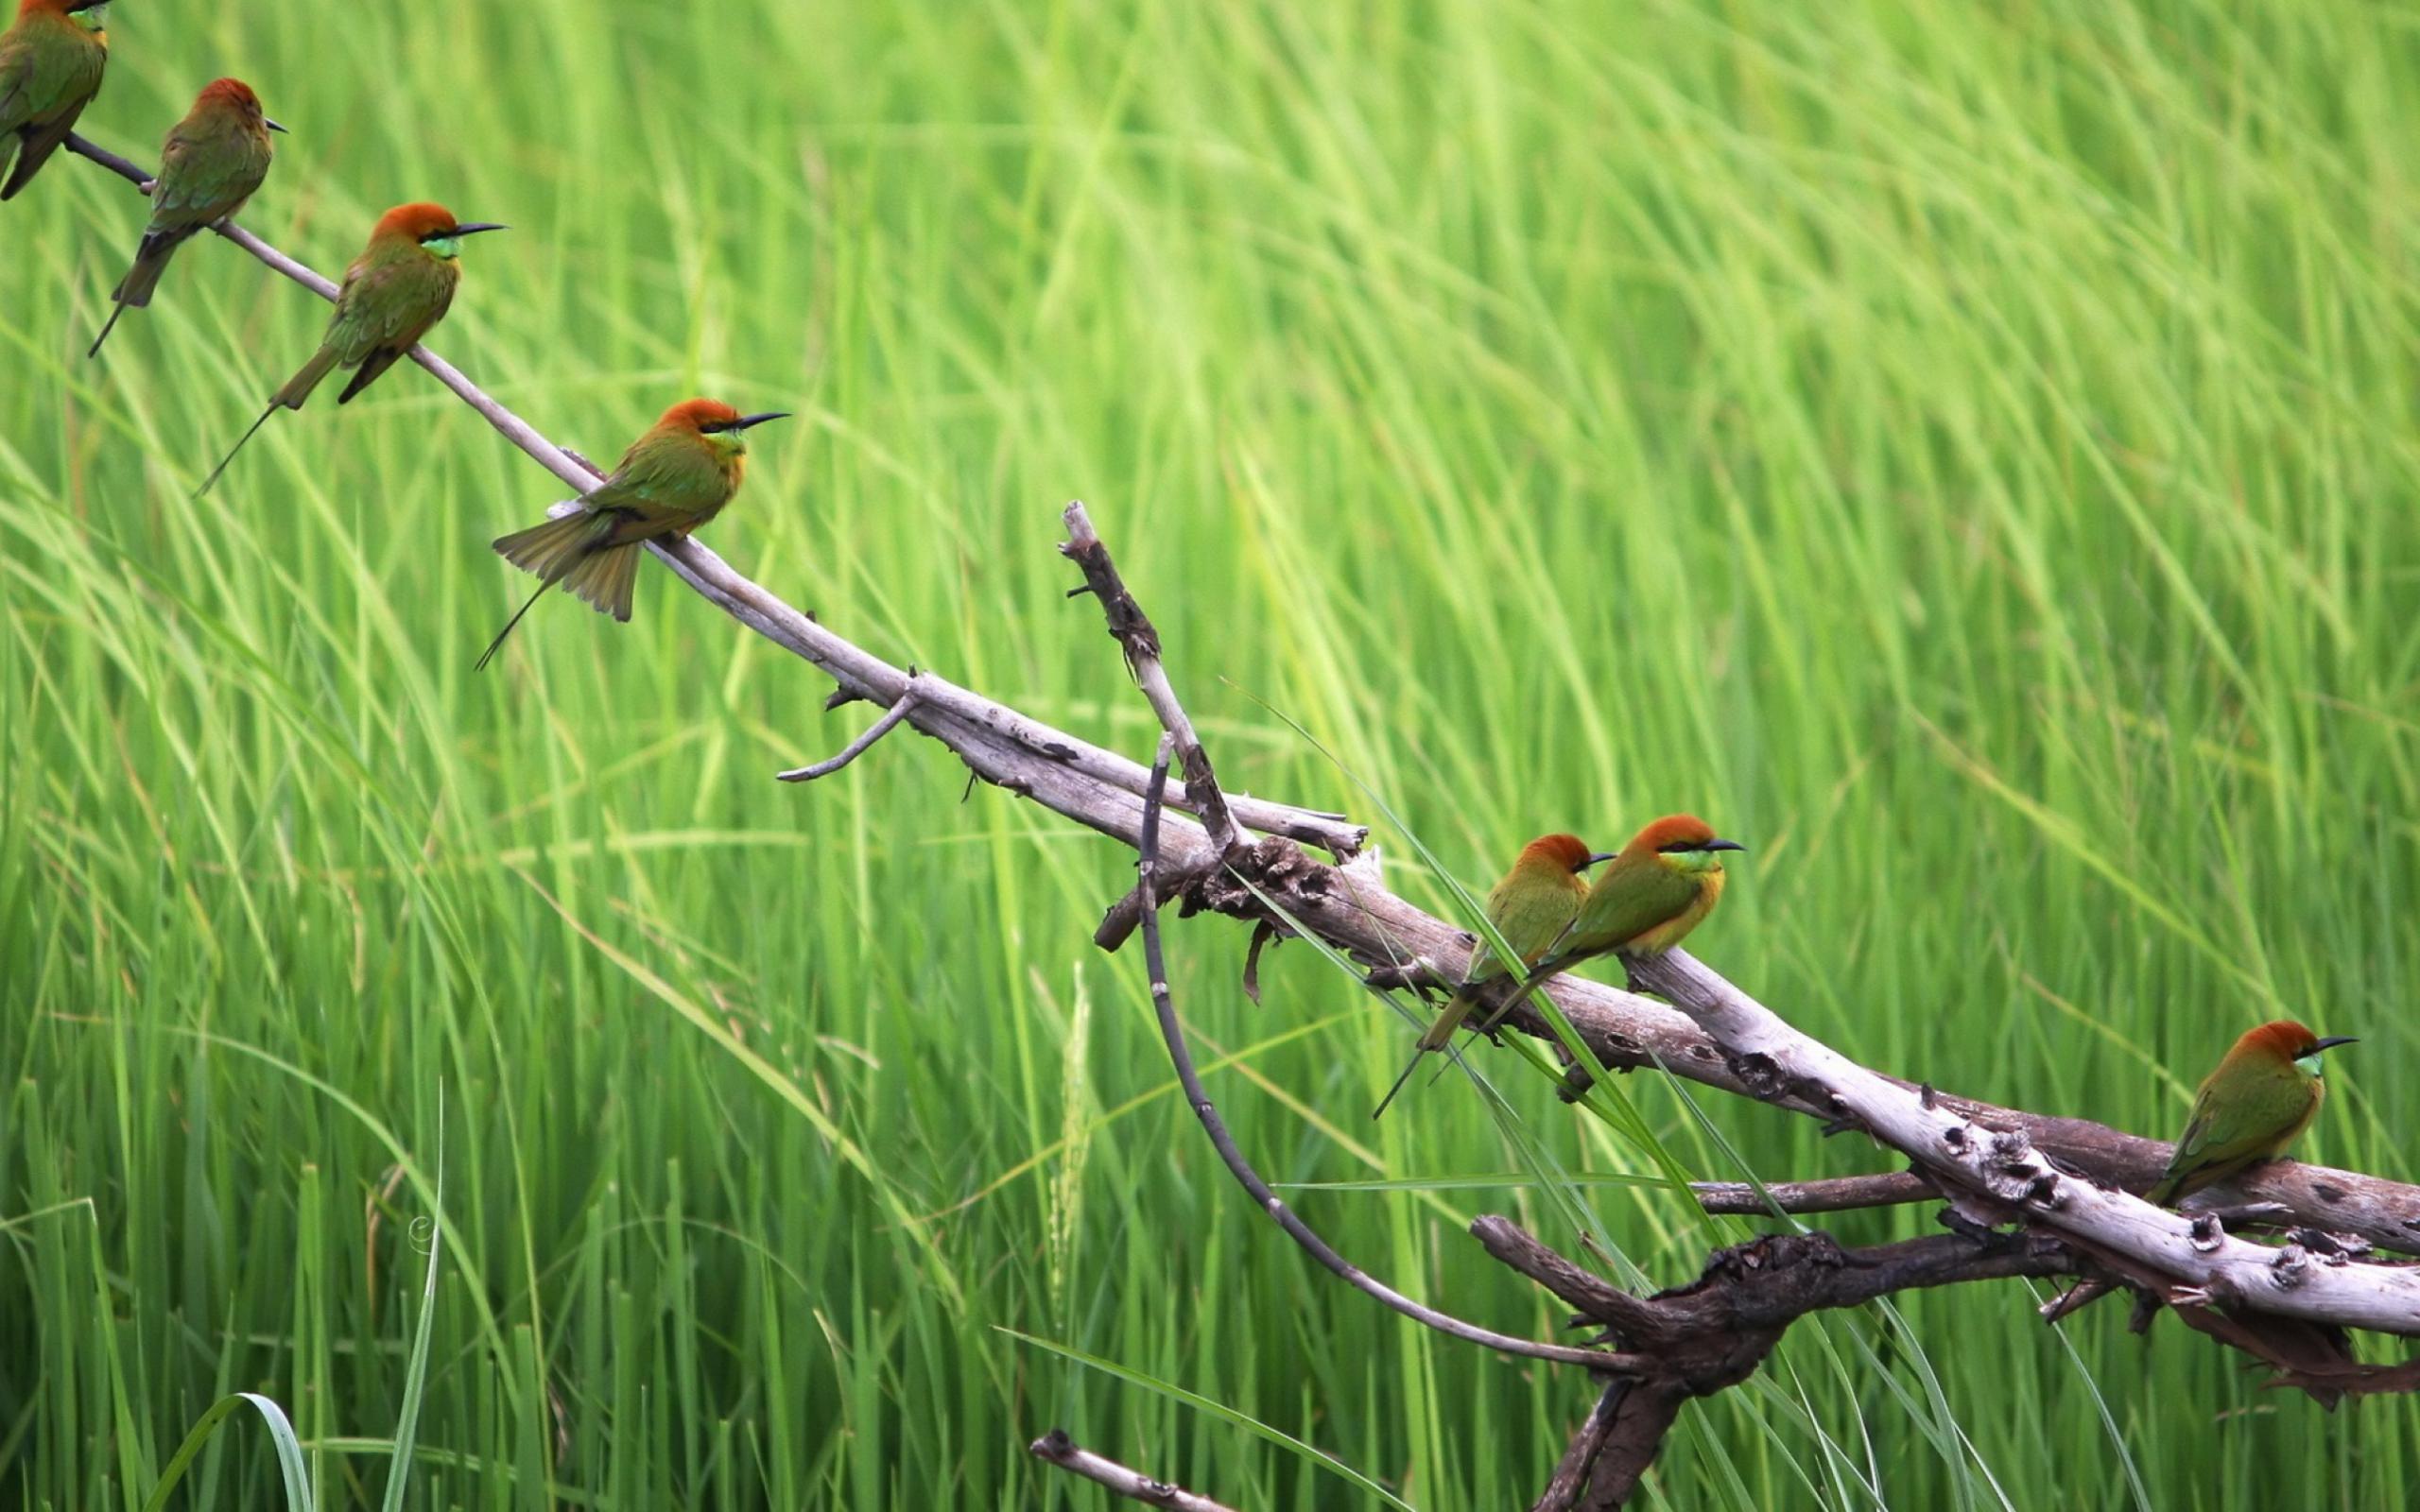 Две птички на стебле кукурузы  № 1532805 без смс